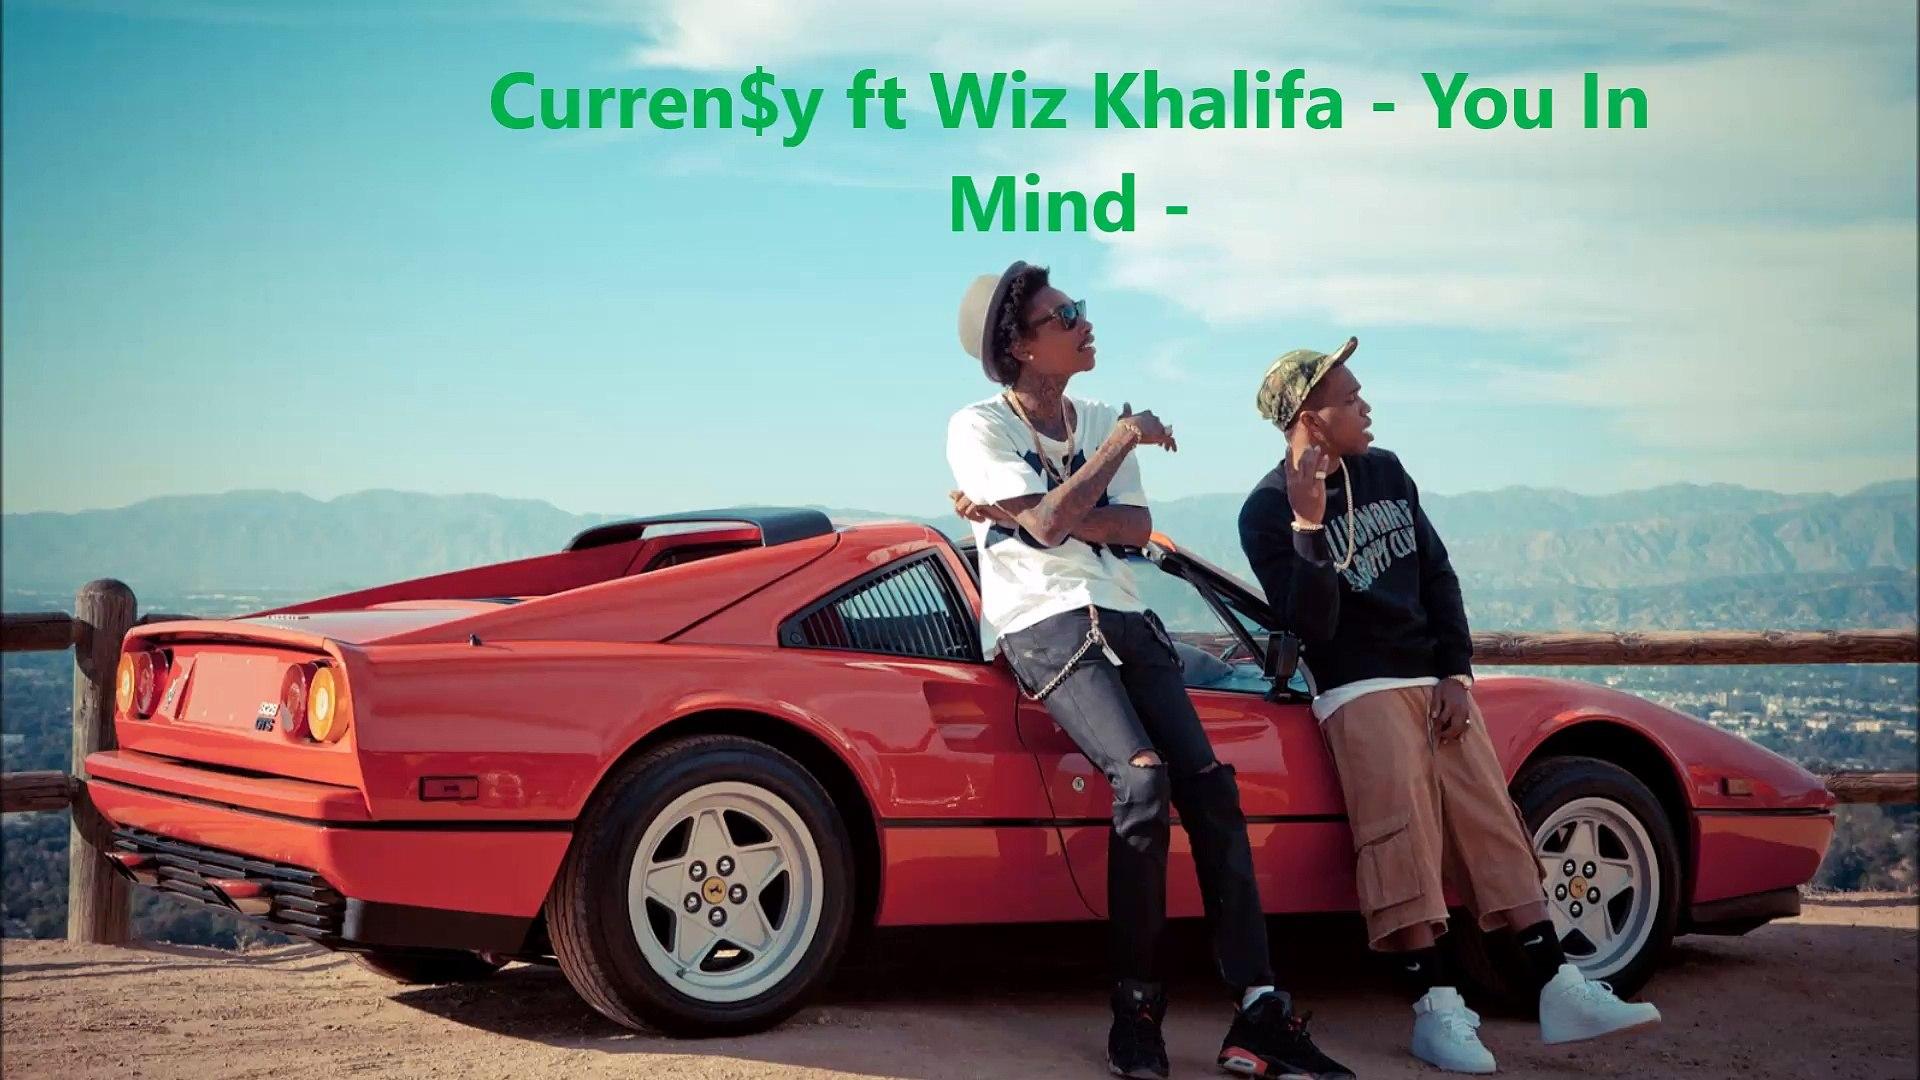 Curren$y ft Wiz Khalifa - You In Mind